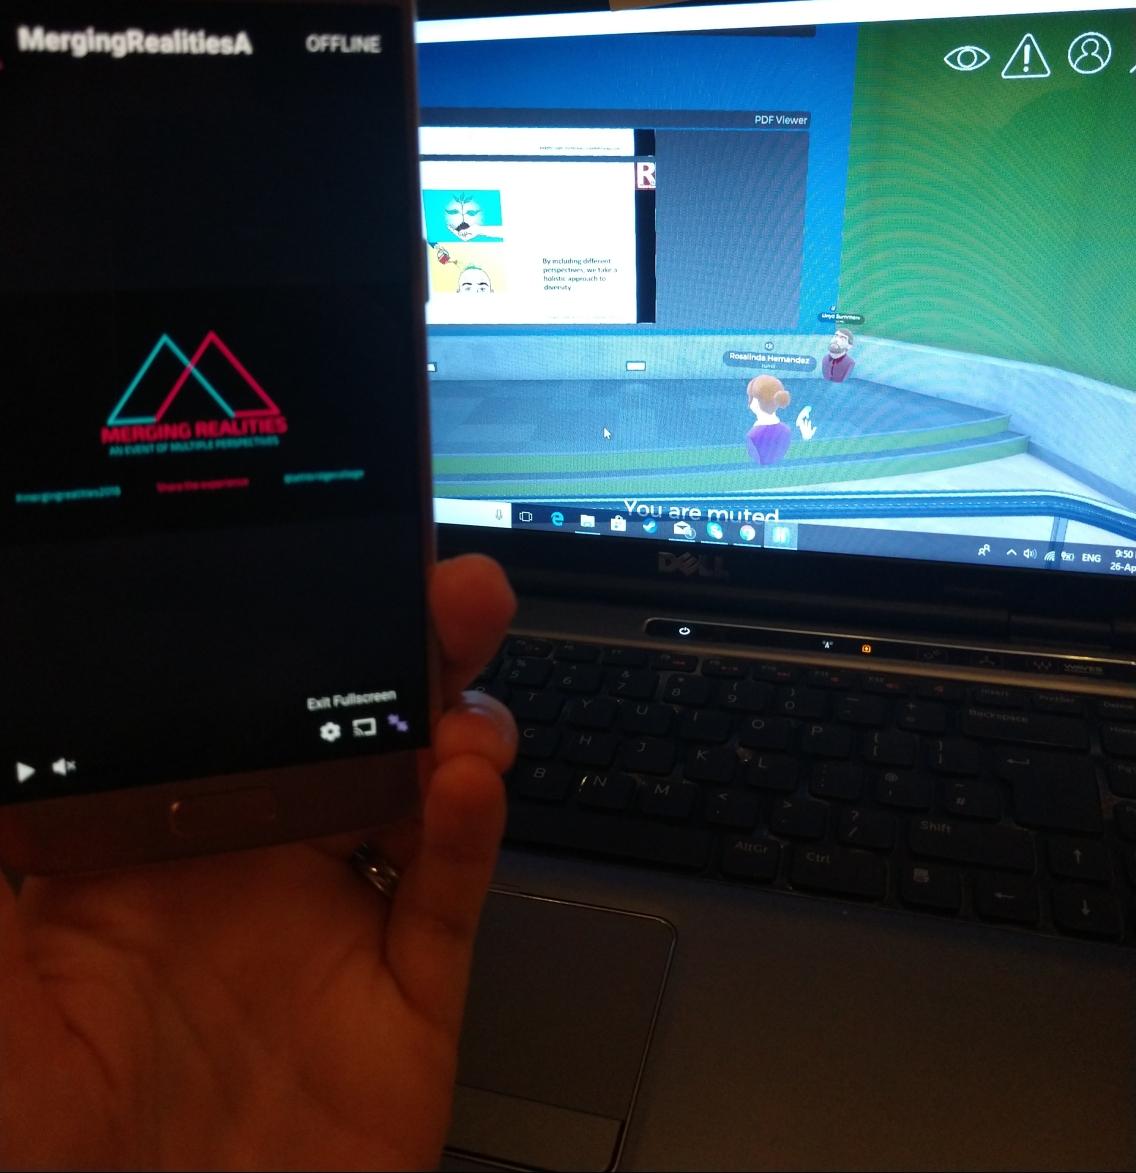 Merging Realities desktop and mobile